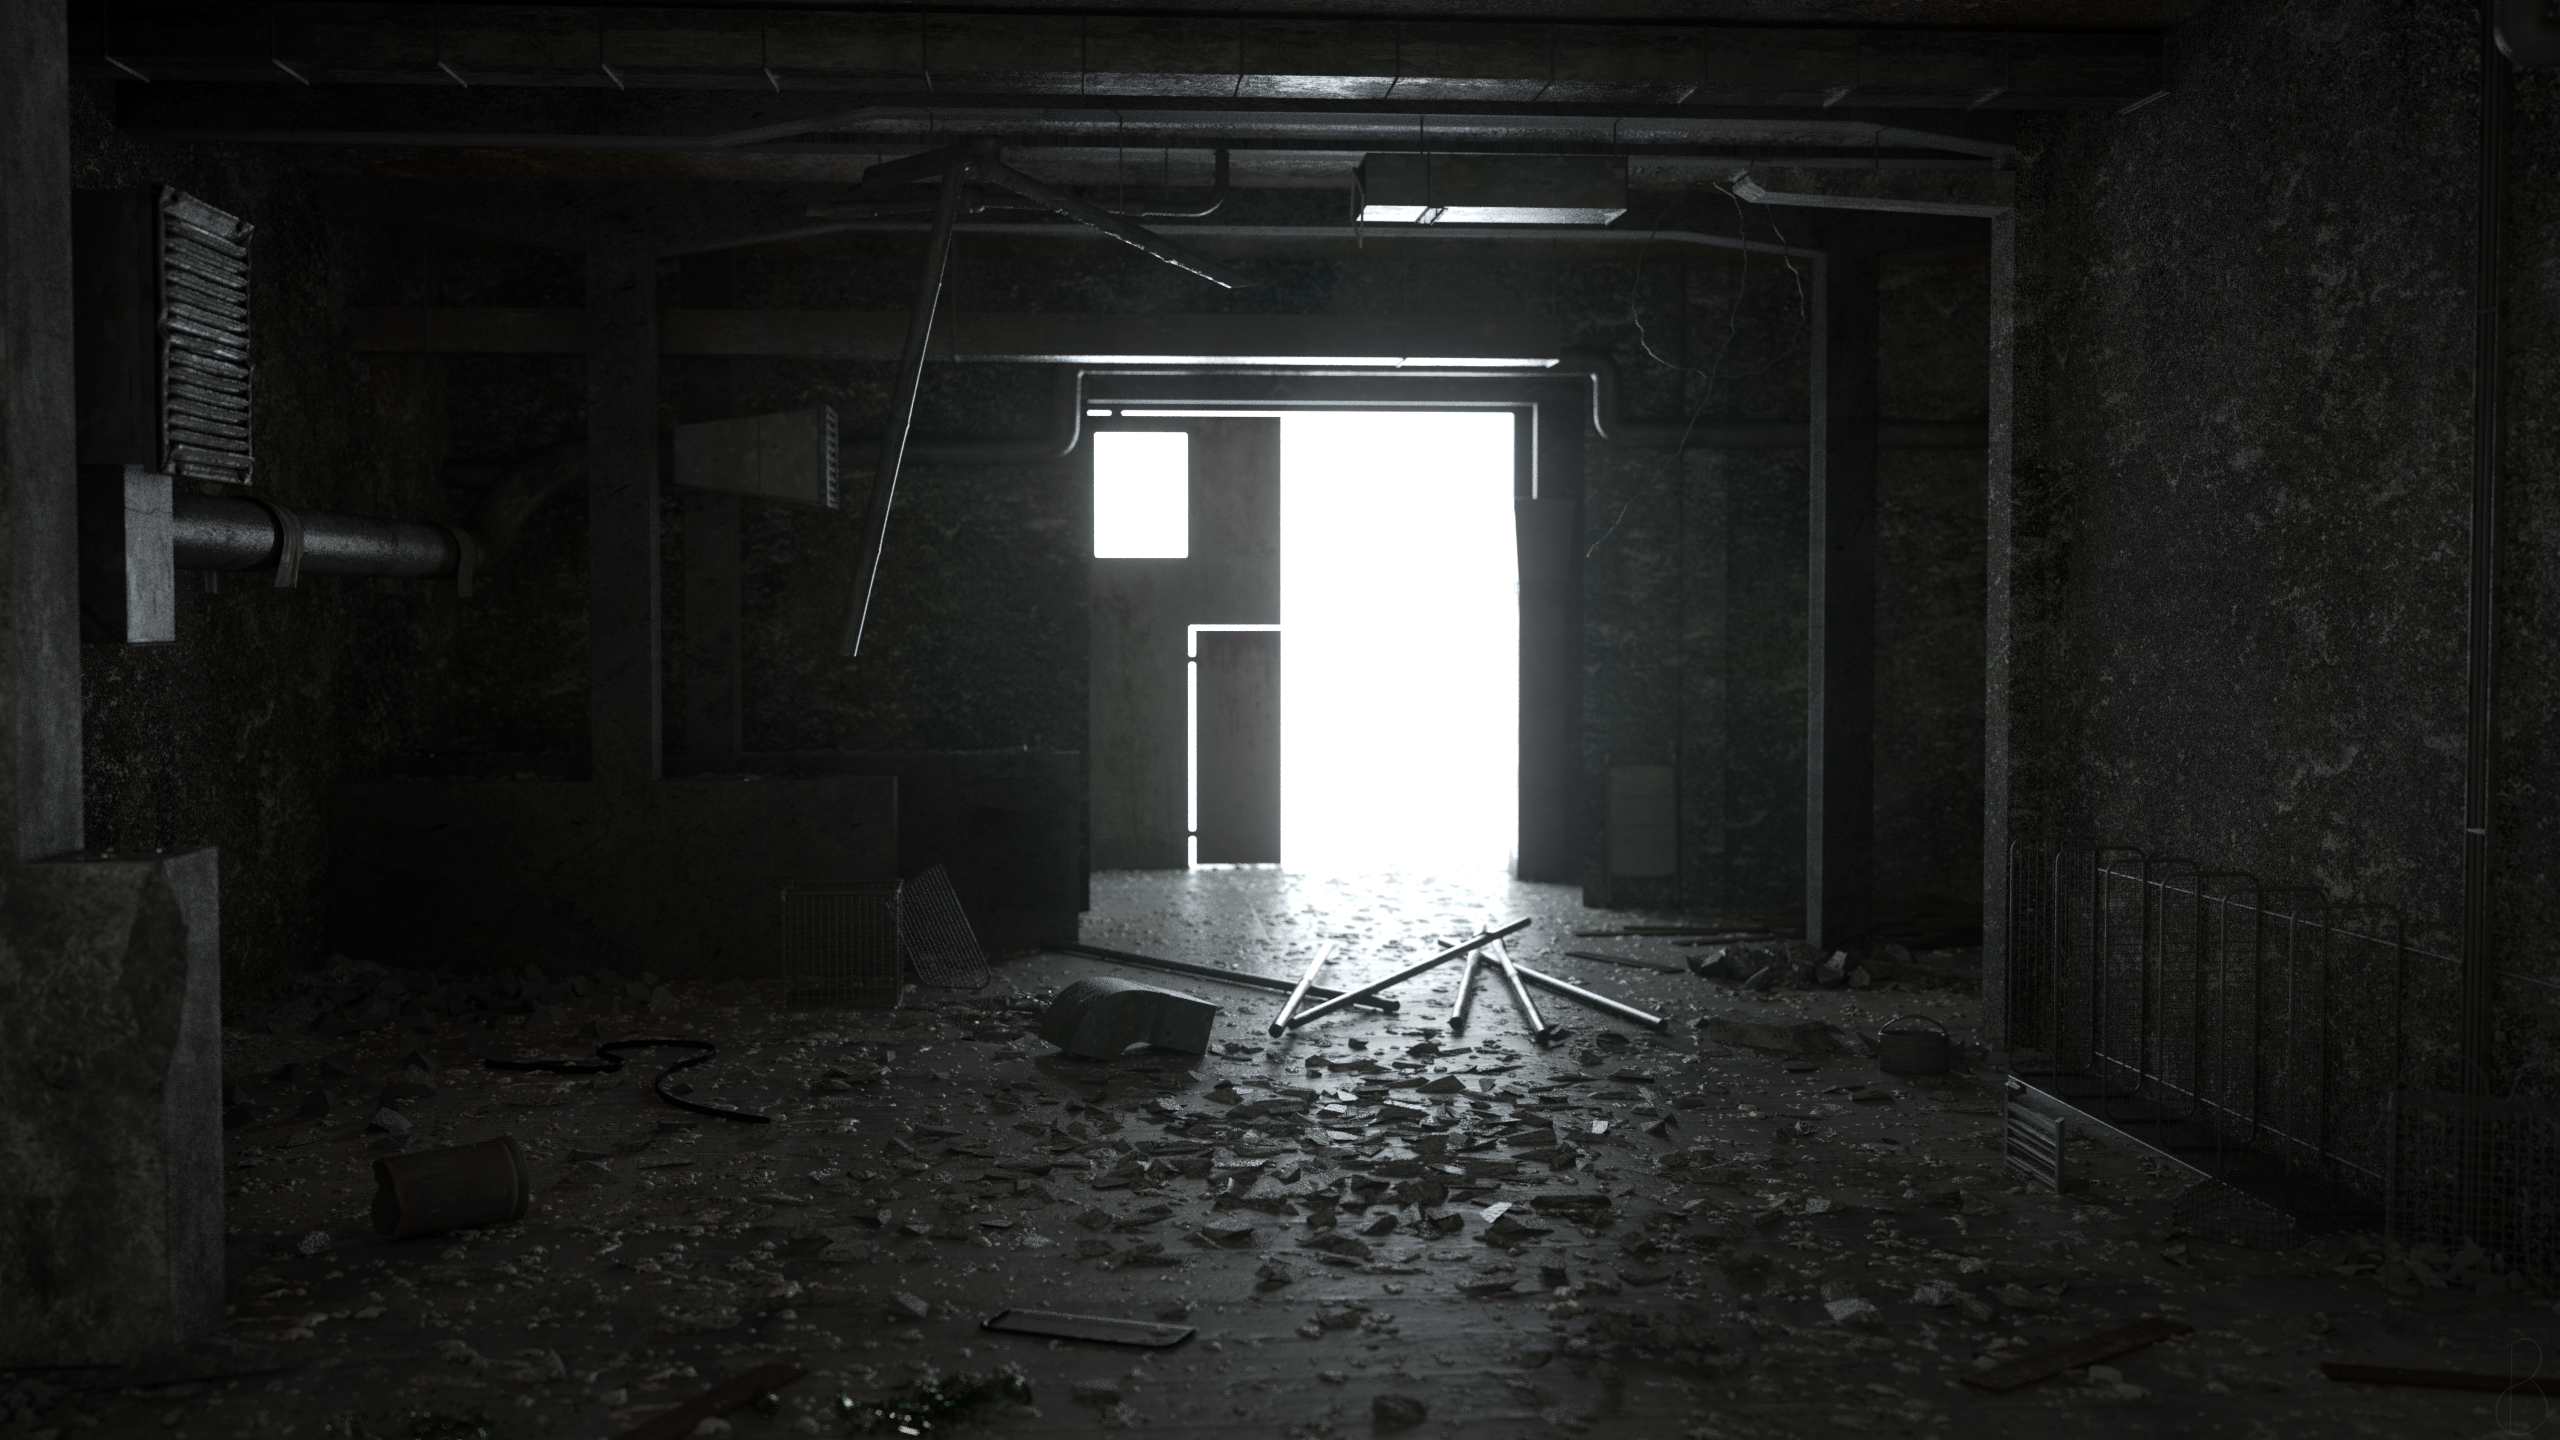 General 2560x1440 abandoned building factory factory tubes Chernobyl dirt grunge desolate lattice debris rust trash CGI 3D graphics